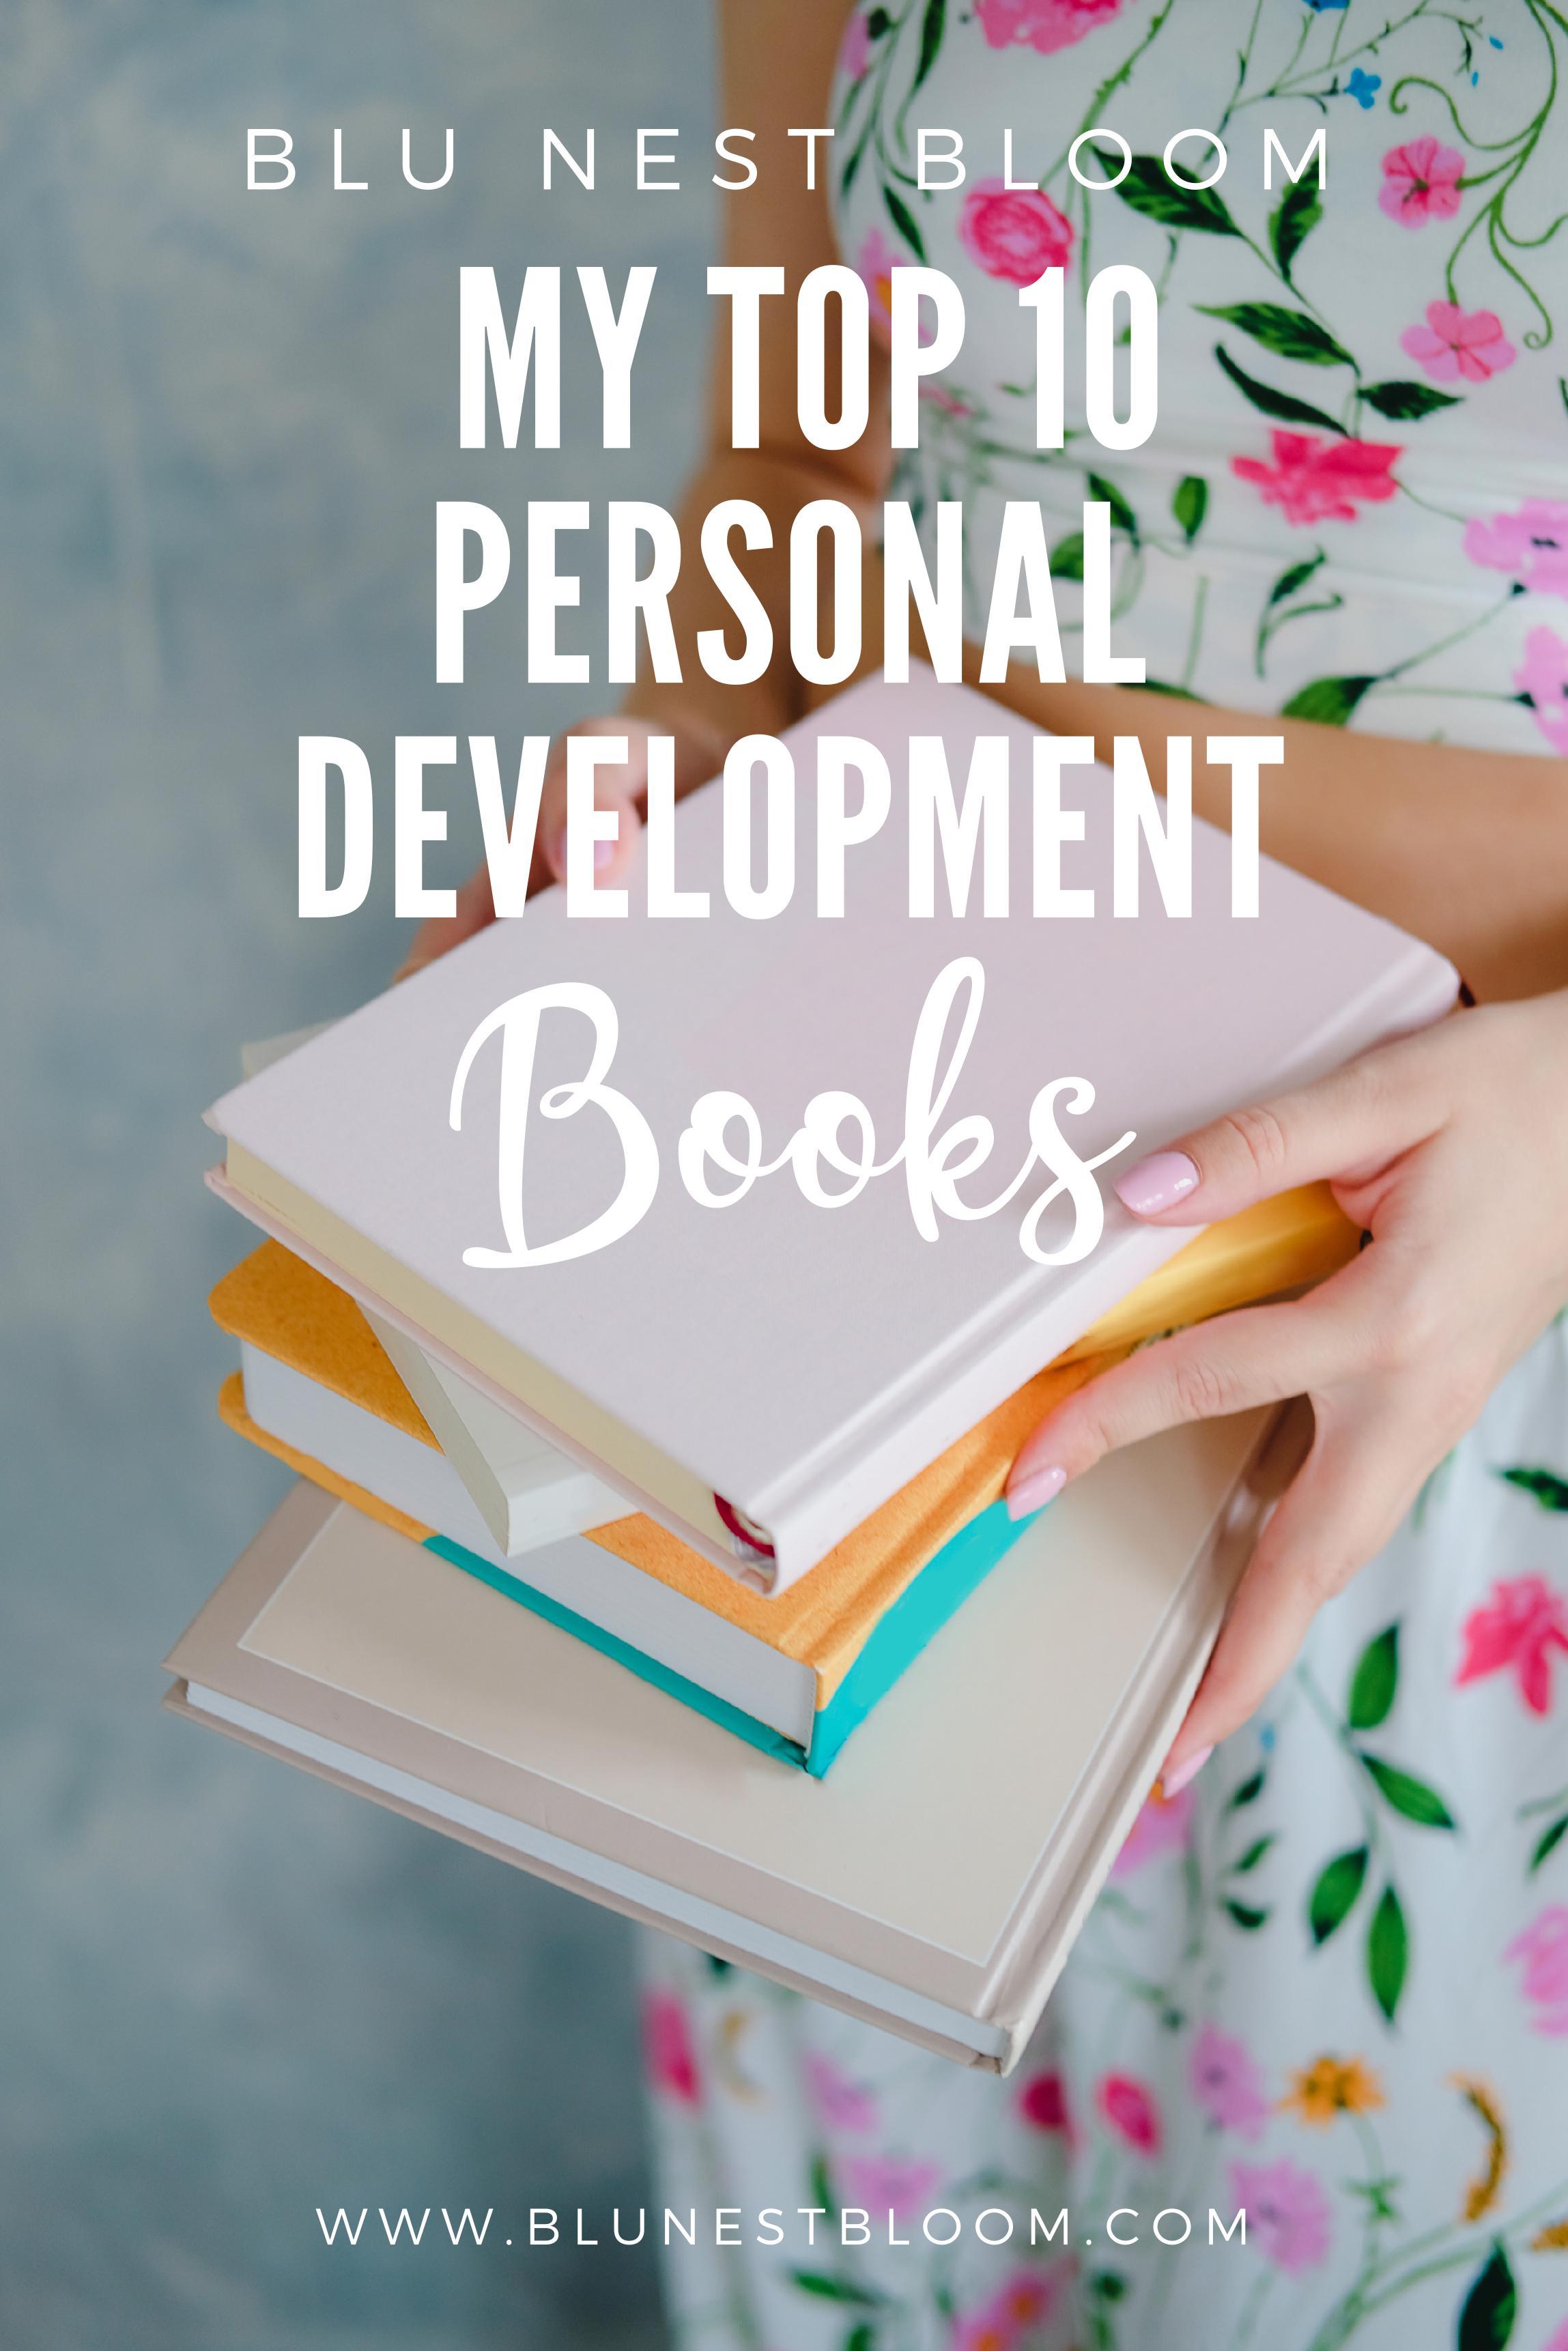 My Top 10 Personal Development Books